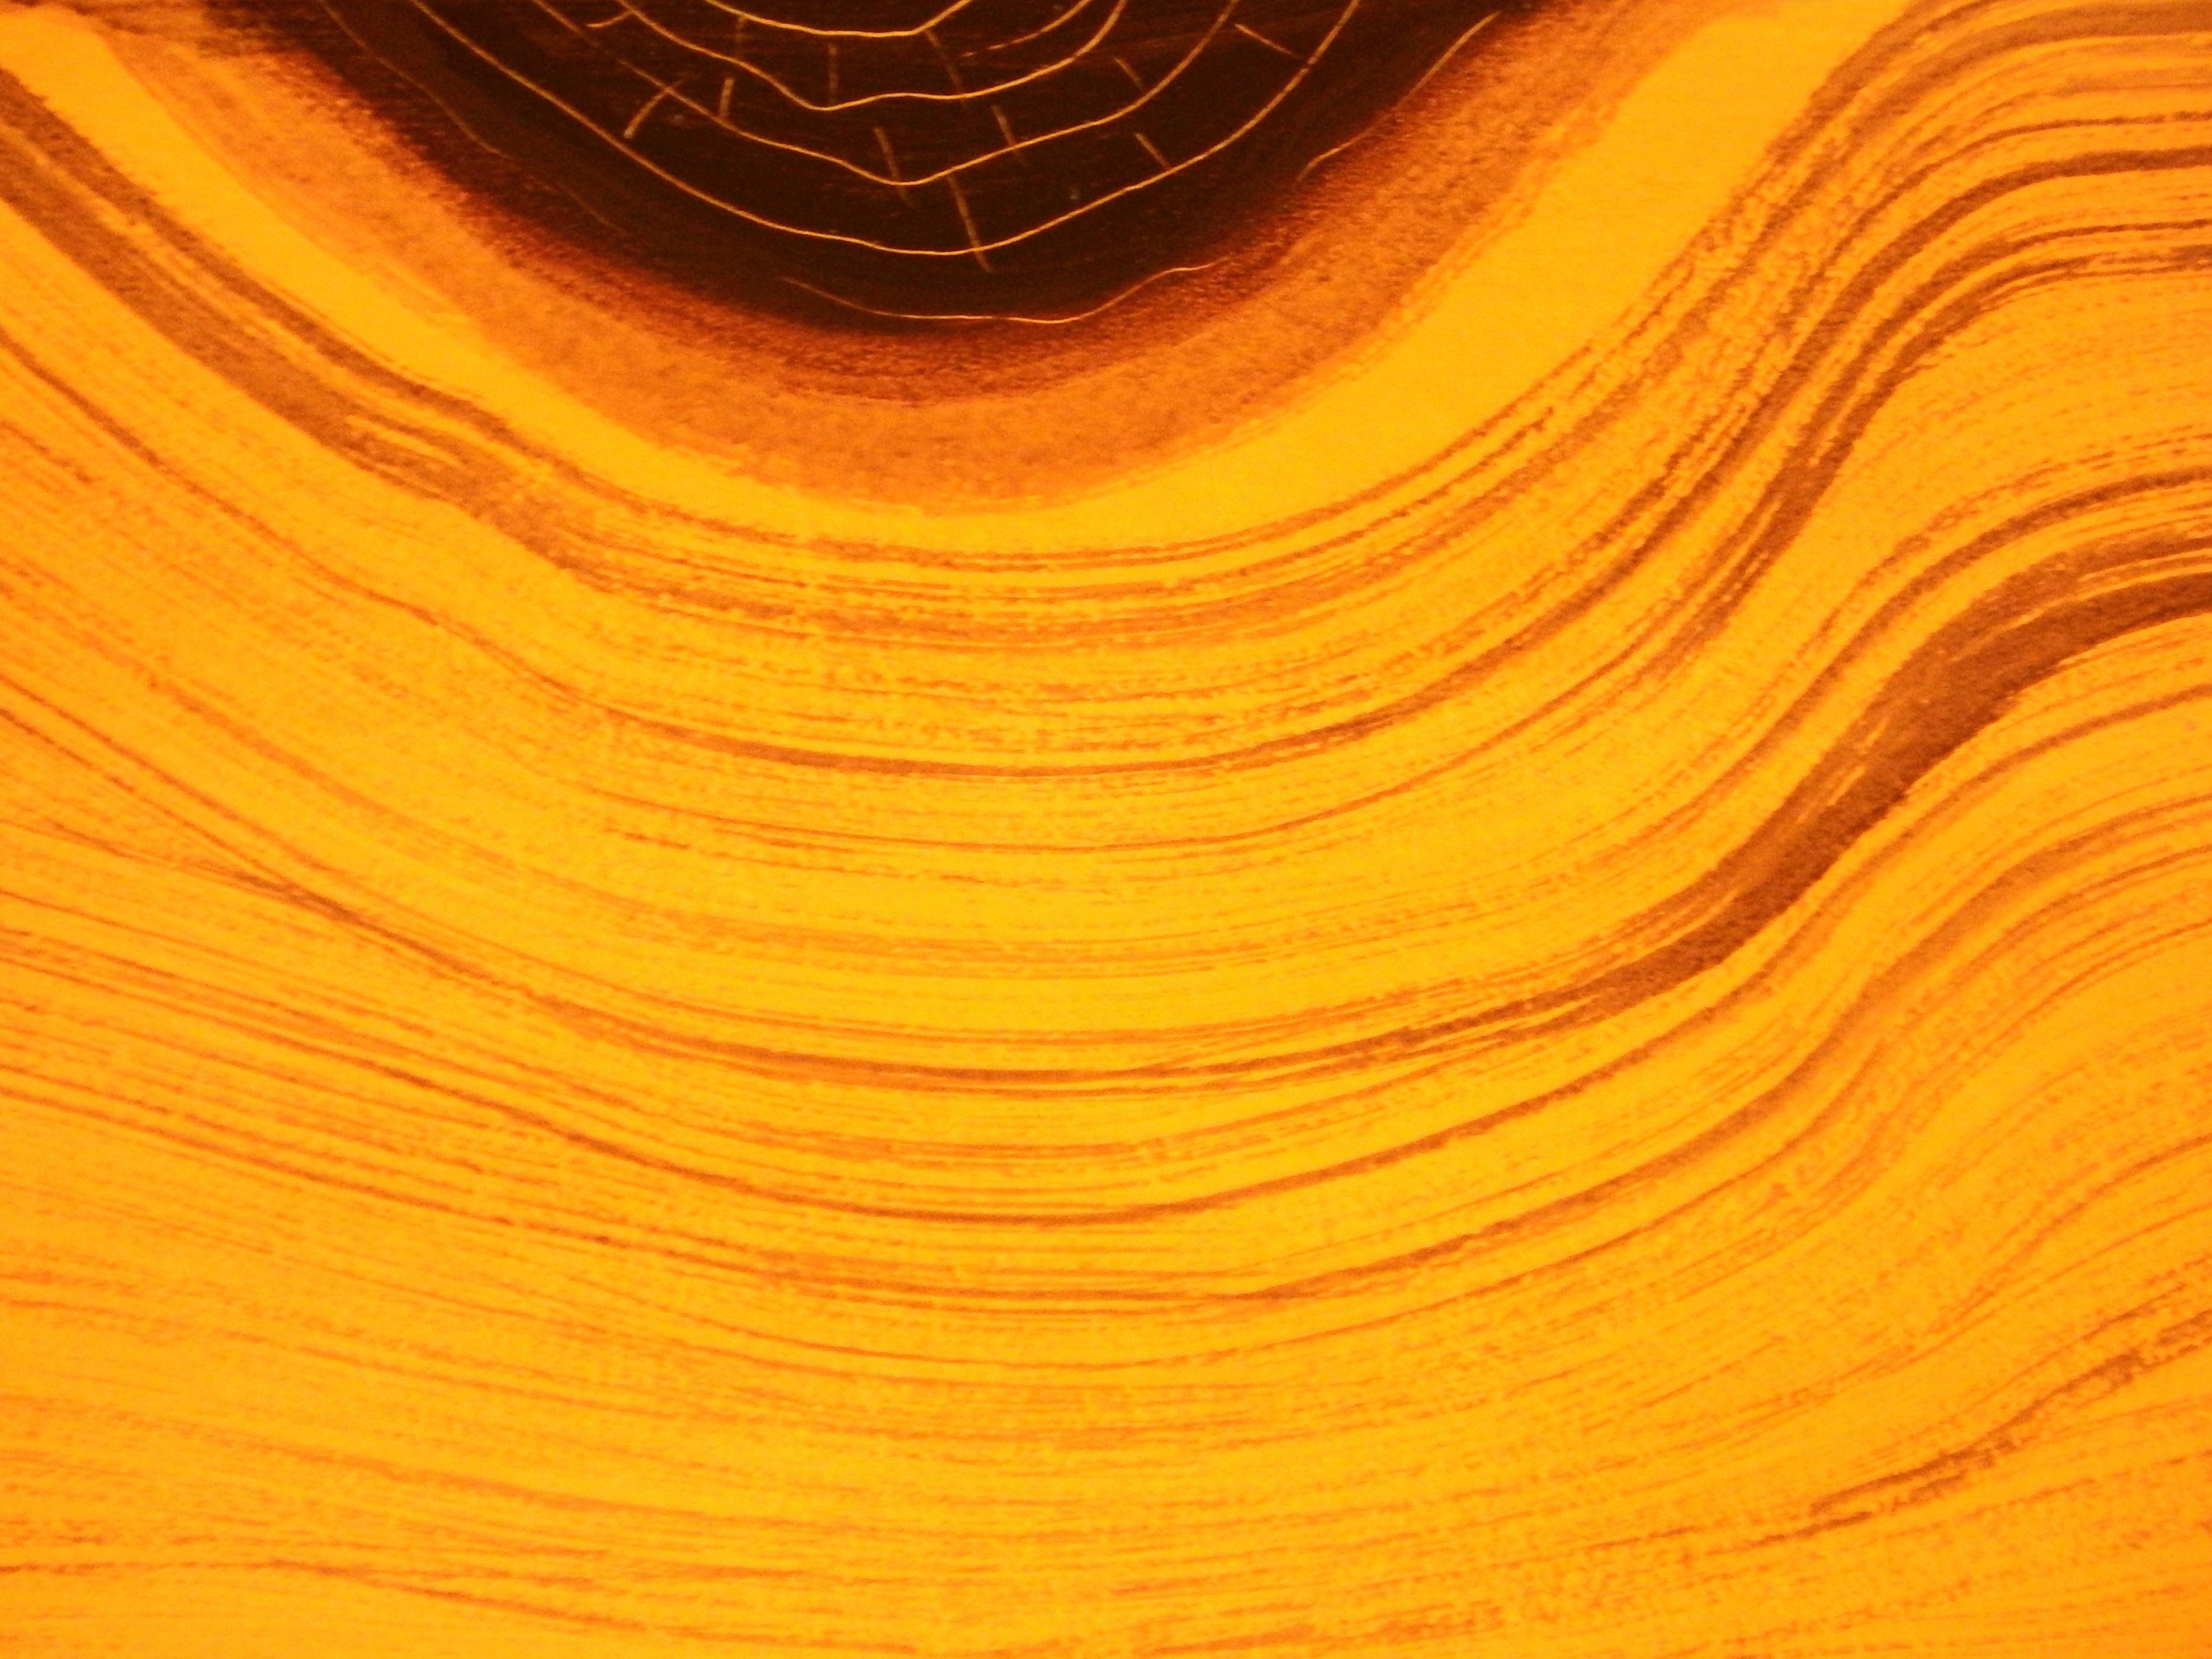 Orange wood grain background photo